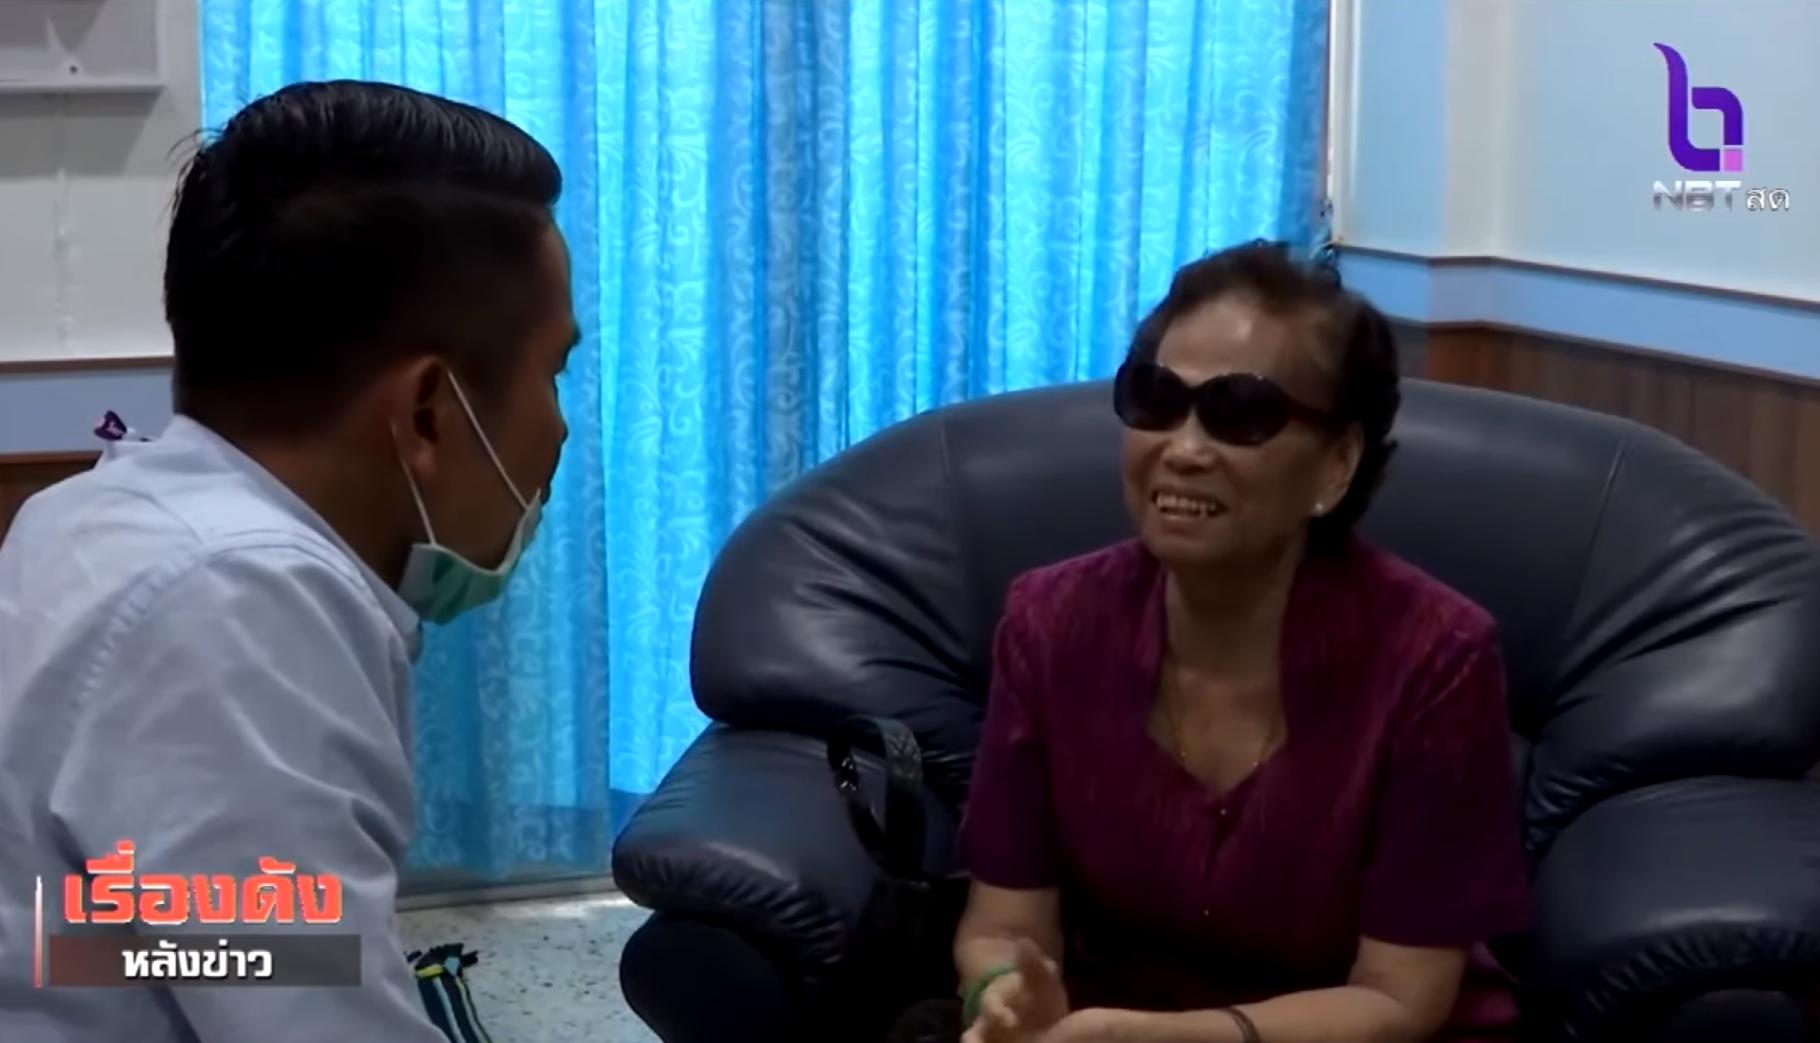 Thai lady cured from Novel Coronavirus treatment